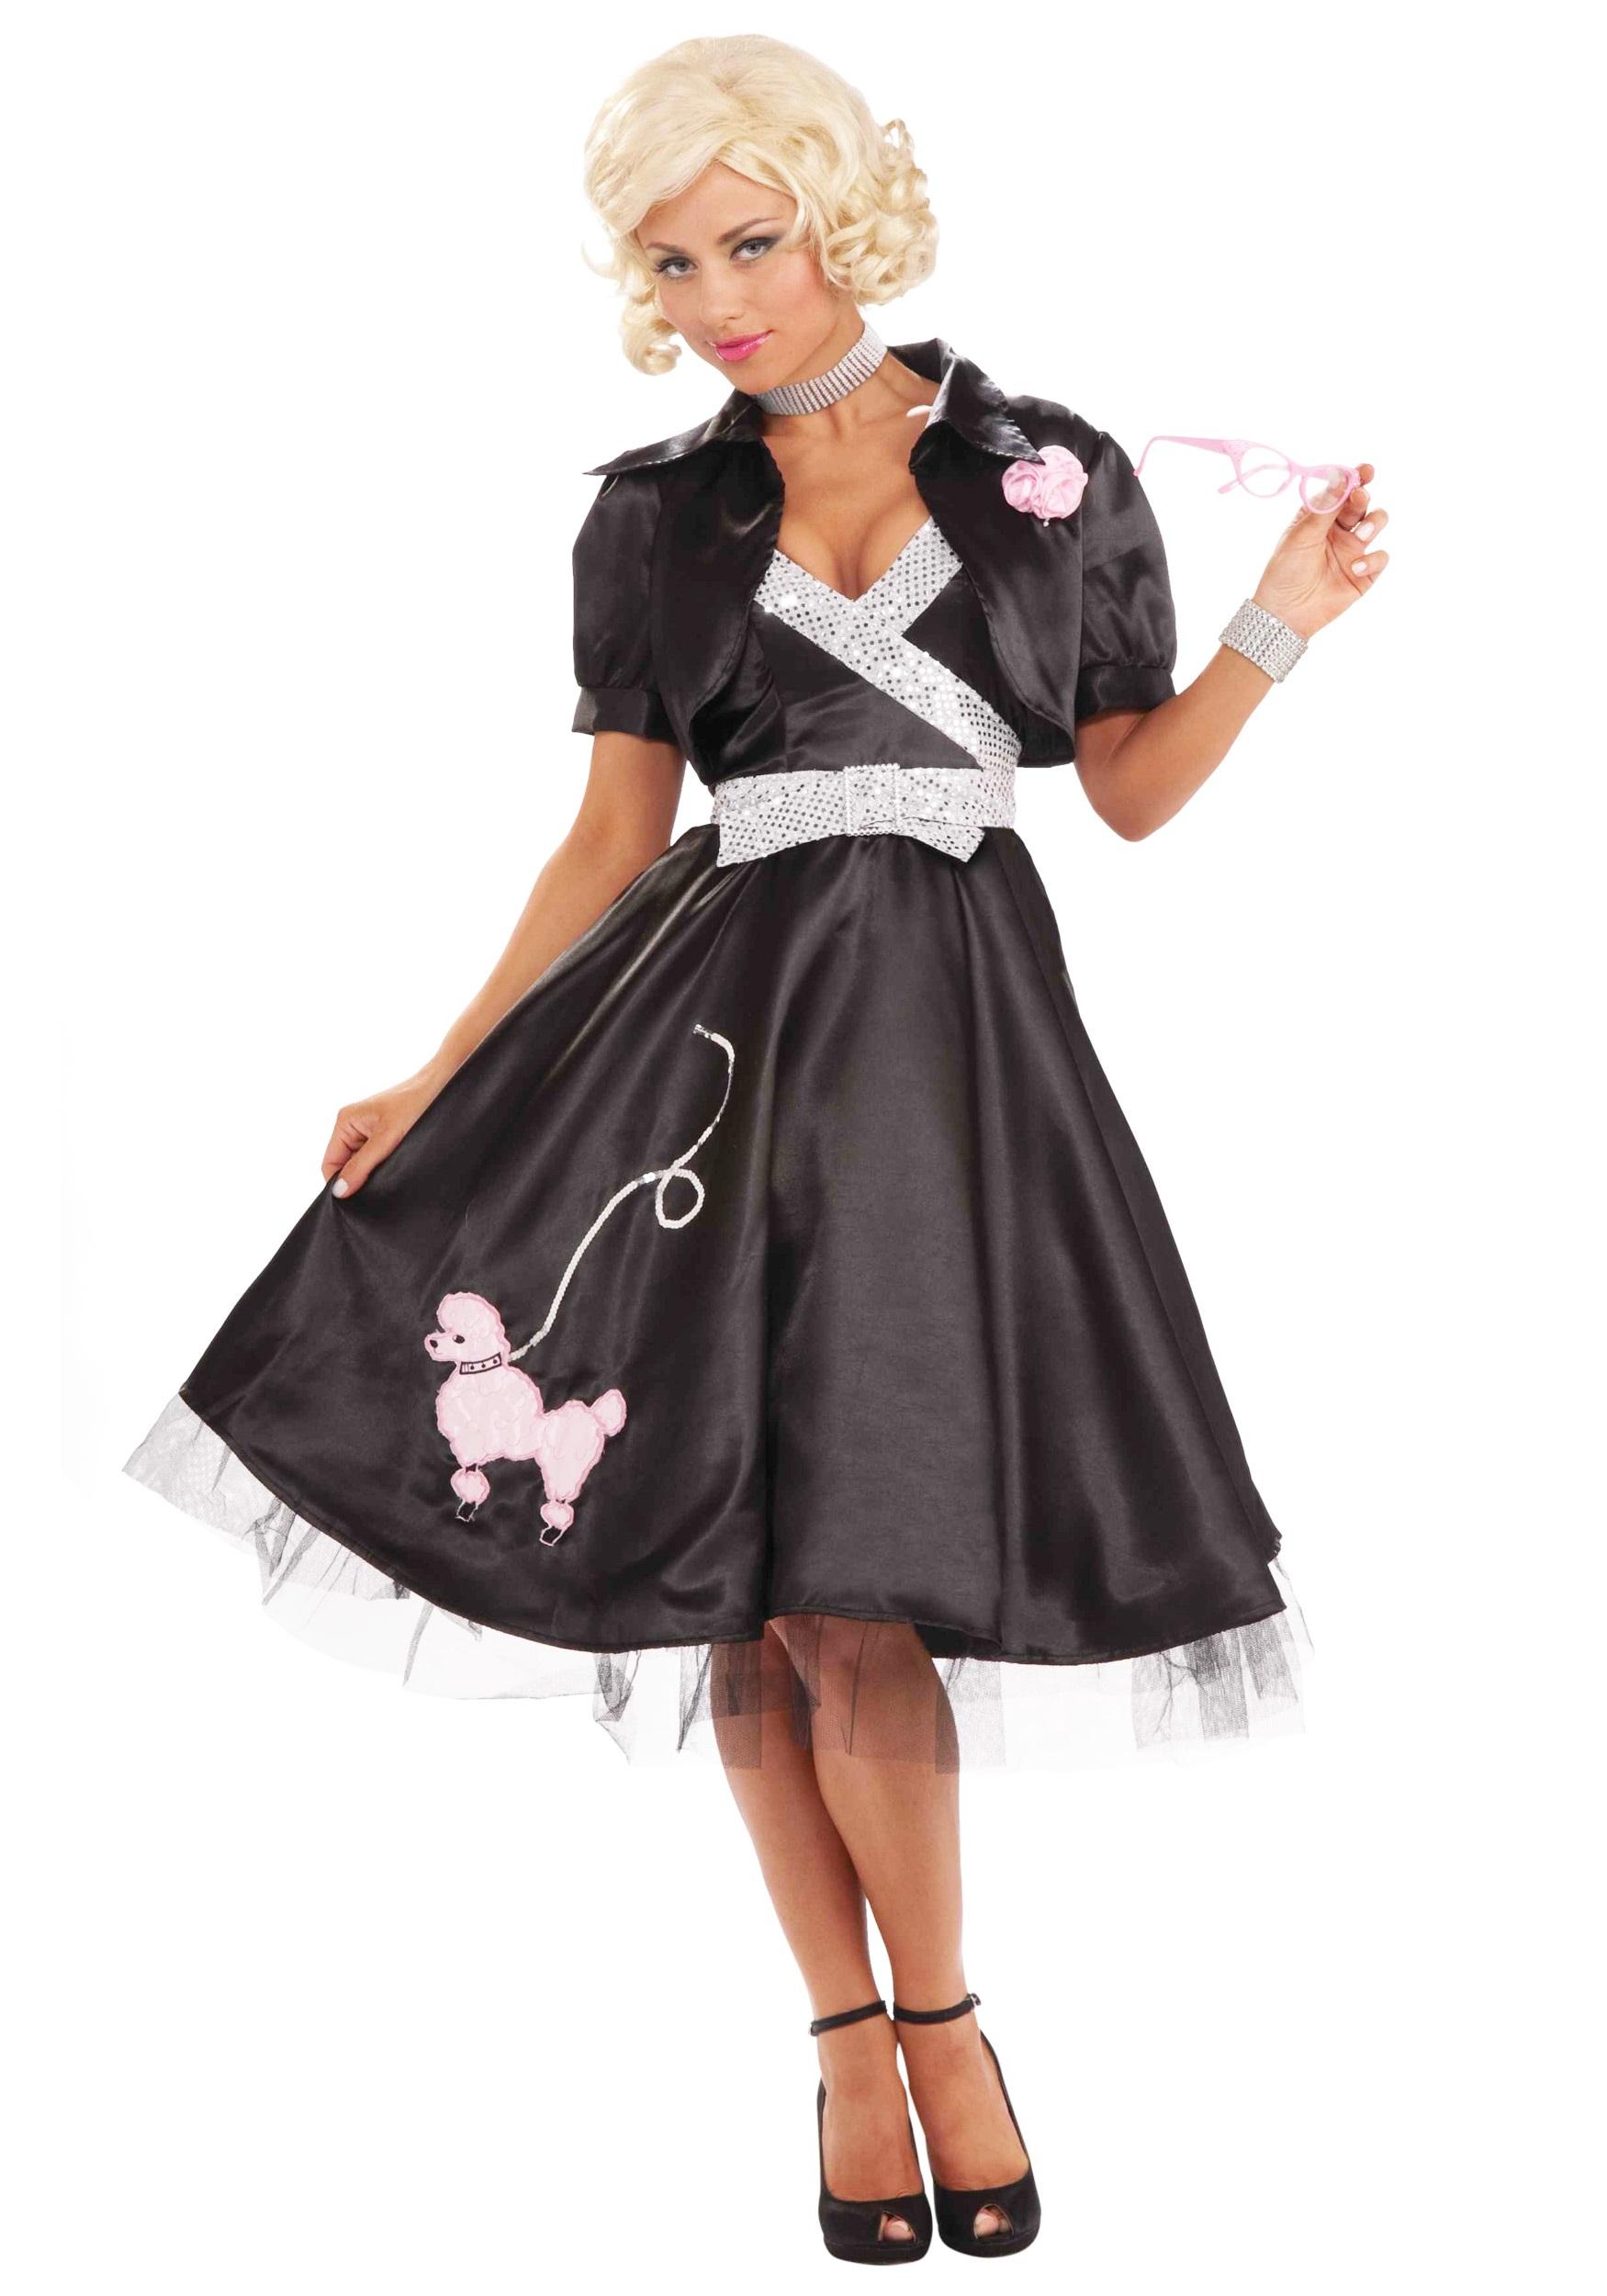 50s-poodle-diva-costume.jpg